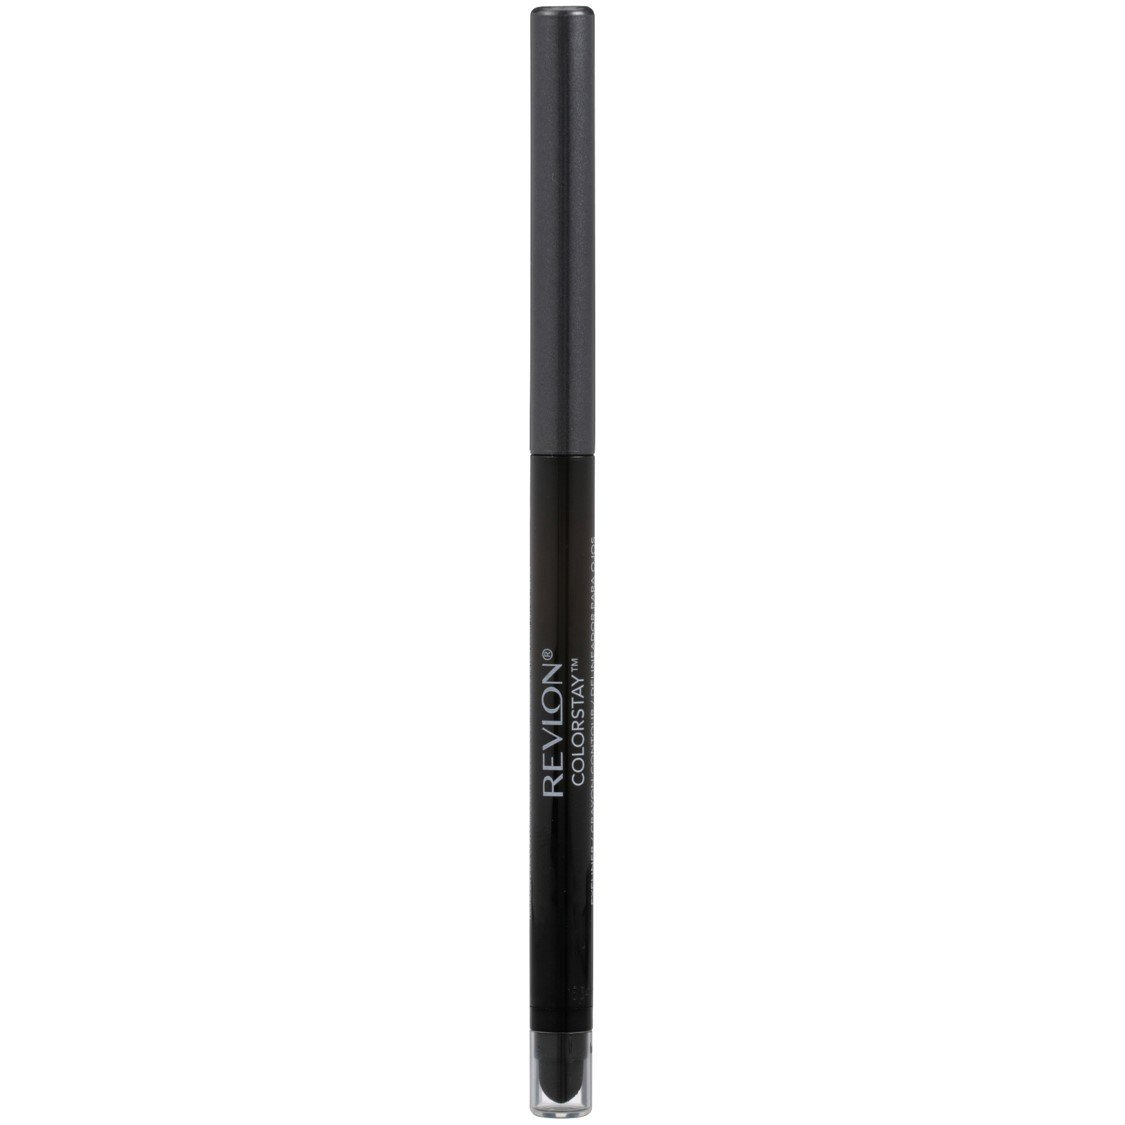 ColorStay Eyeliner Pencil #203 Brown by Revlon for Unisex - 0.28 oz Eyeliner Pencil